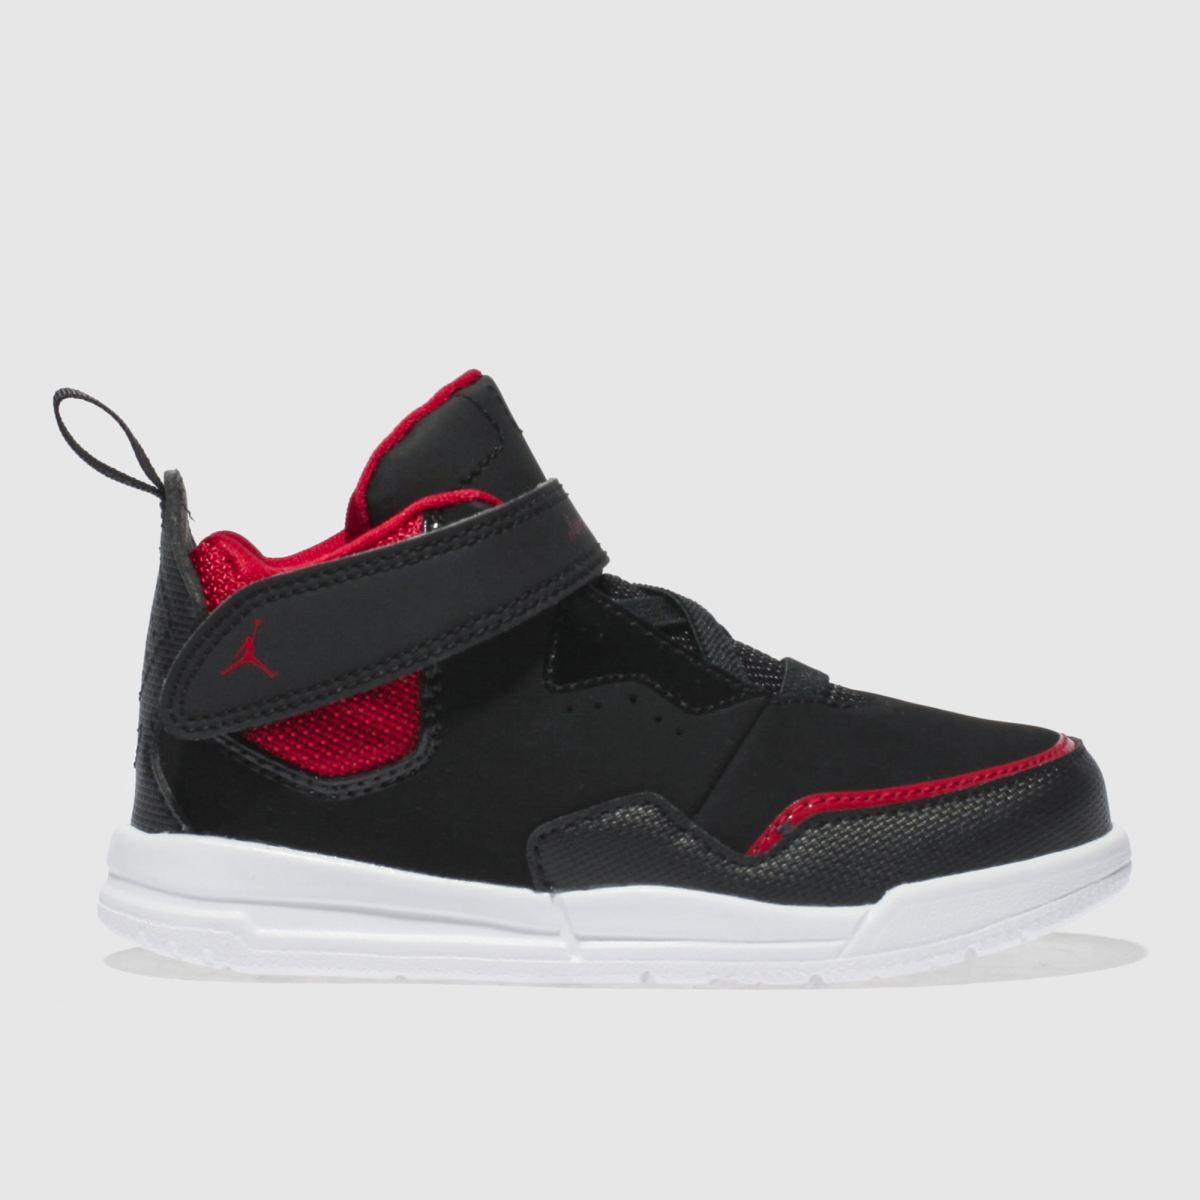 Nike Jordan Black & Red Courtside 23 Trainers Toddler